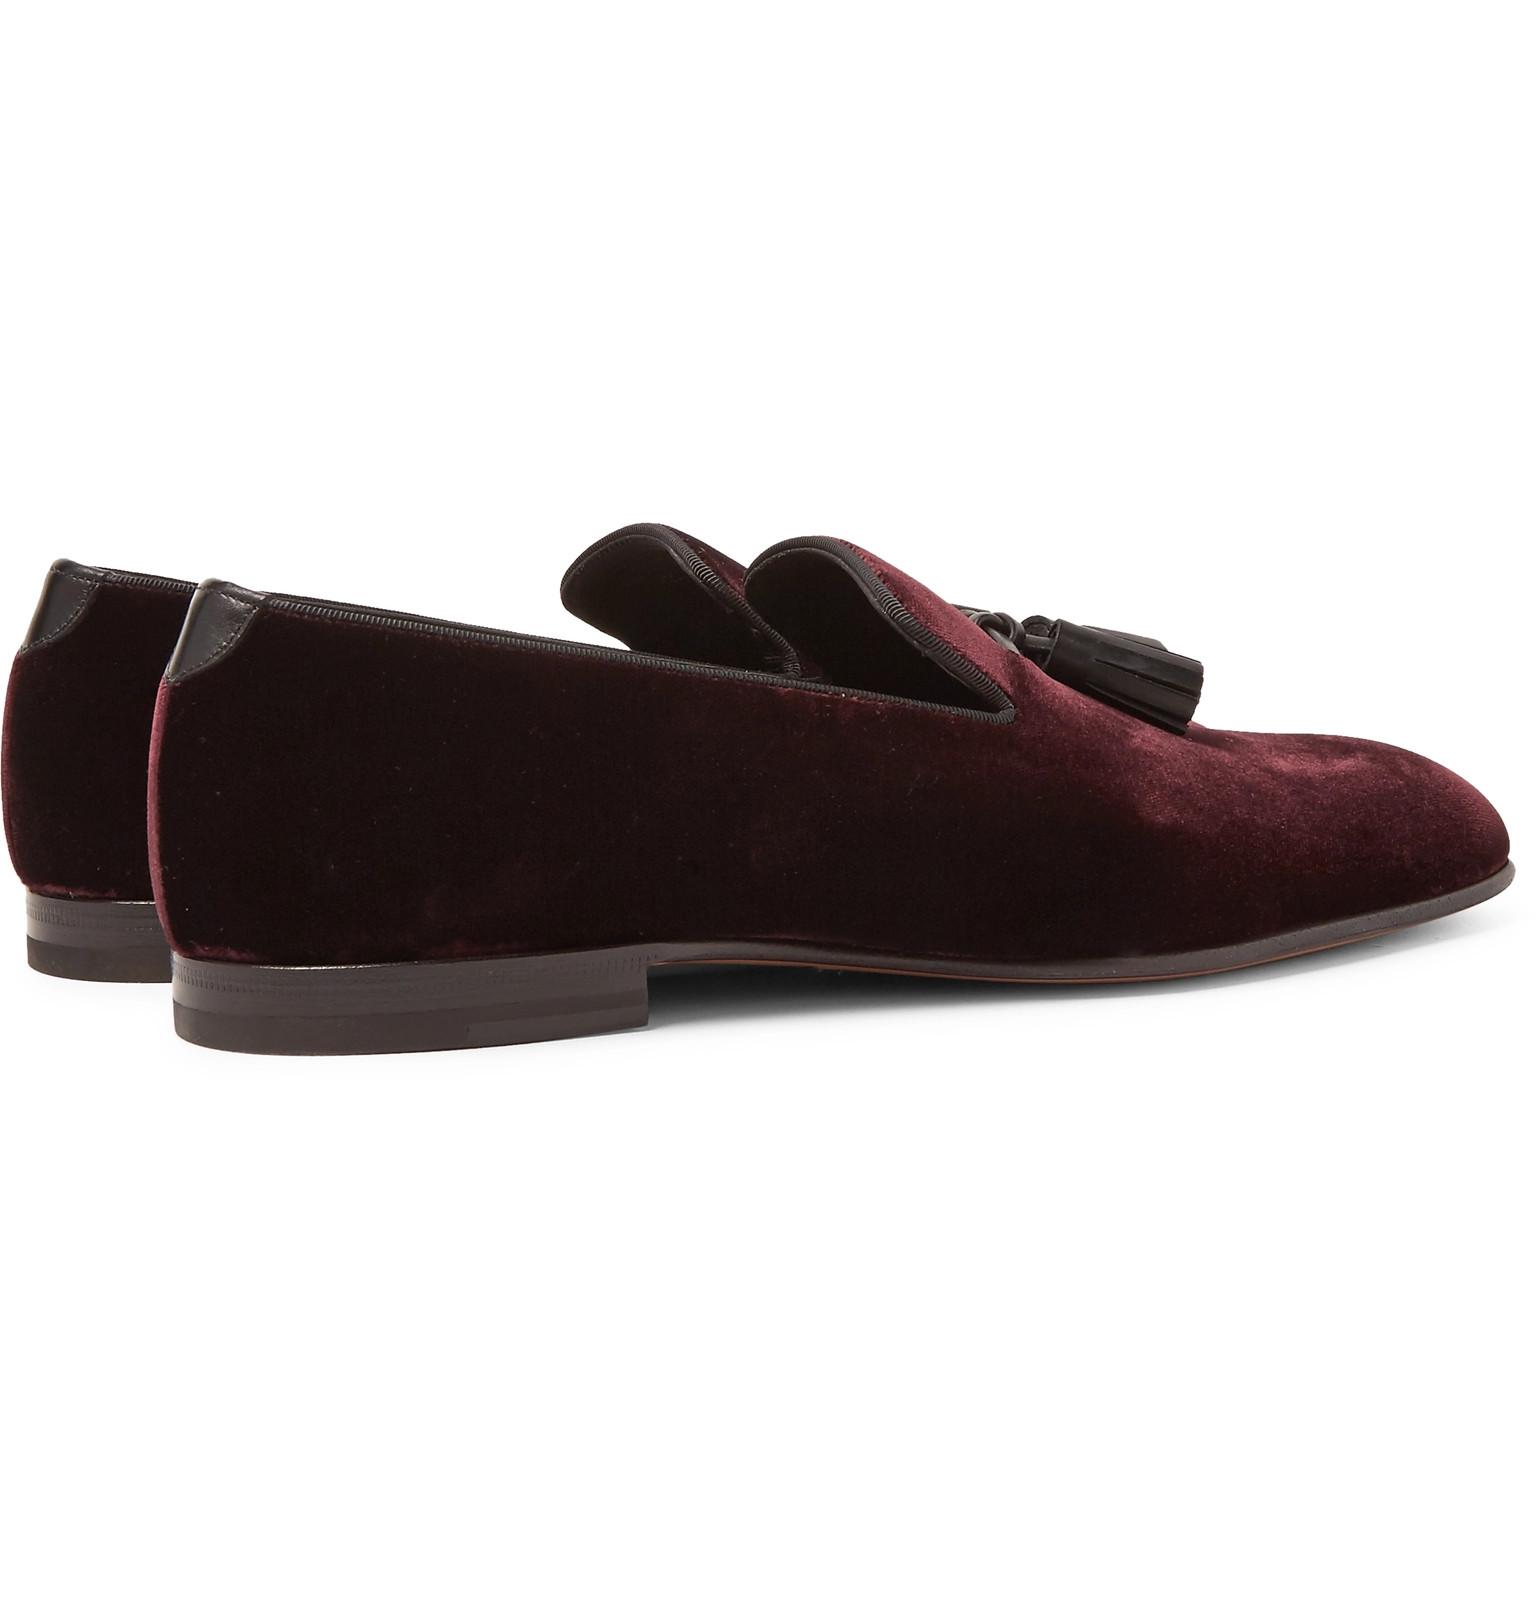 888691b0008 TOM FORD - William Leather-Trimmed Velvet Tasselled Loafers